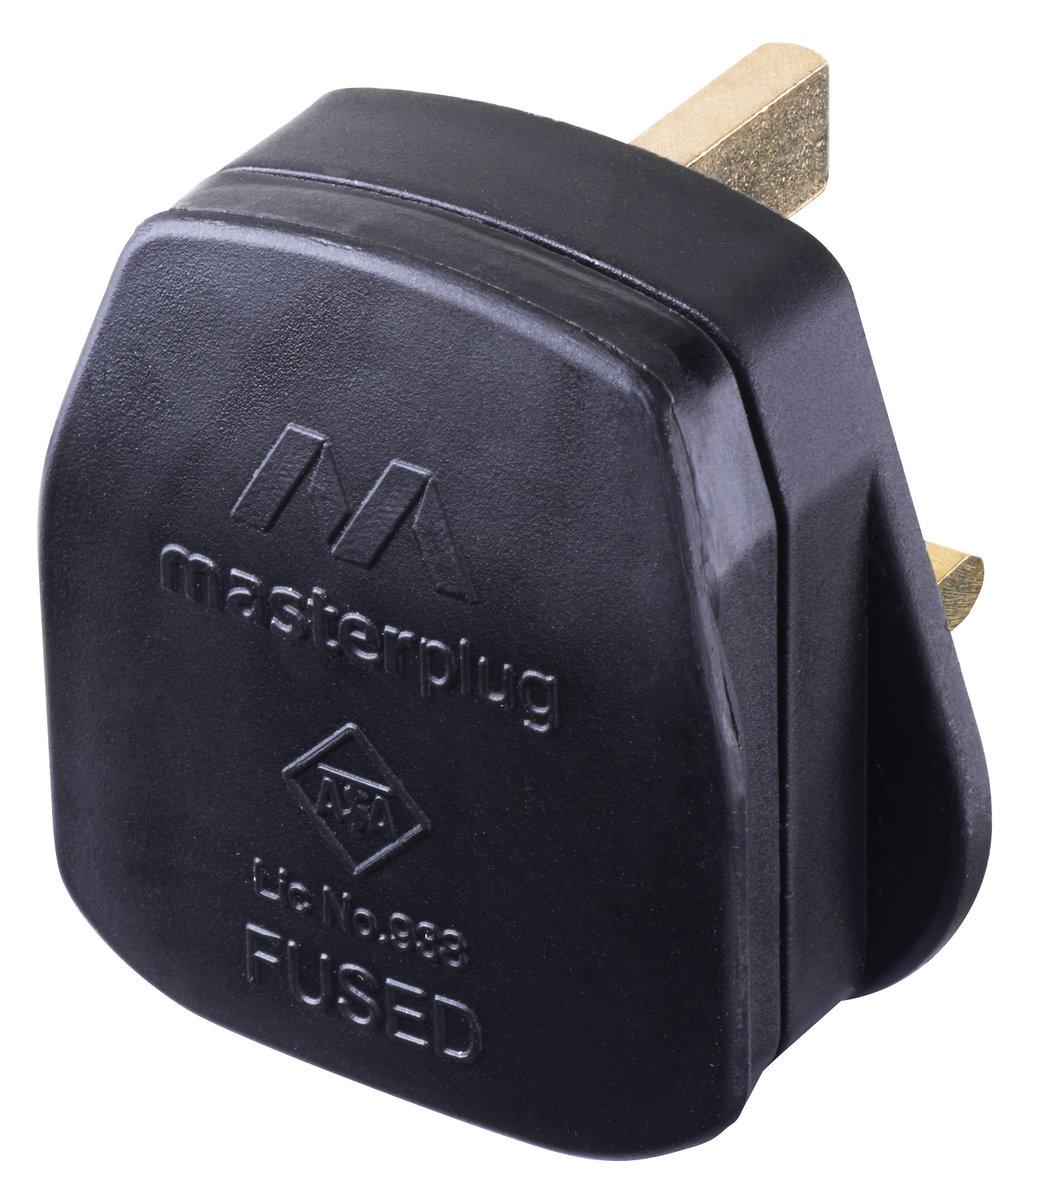 13A保險絲英式三腳插頭 可重新接電線 黑色 PT13B